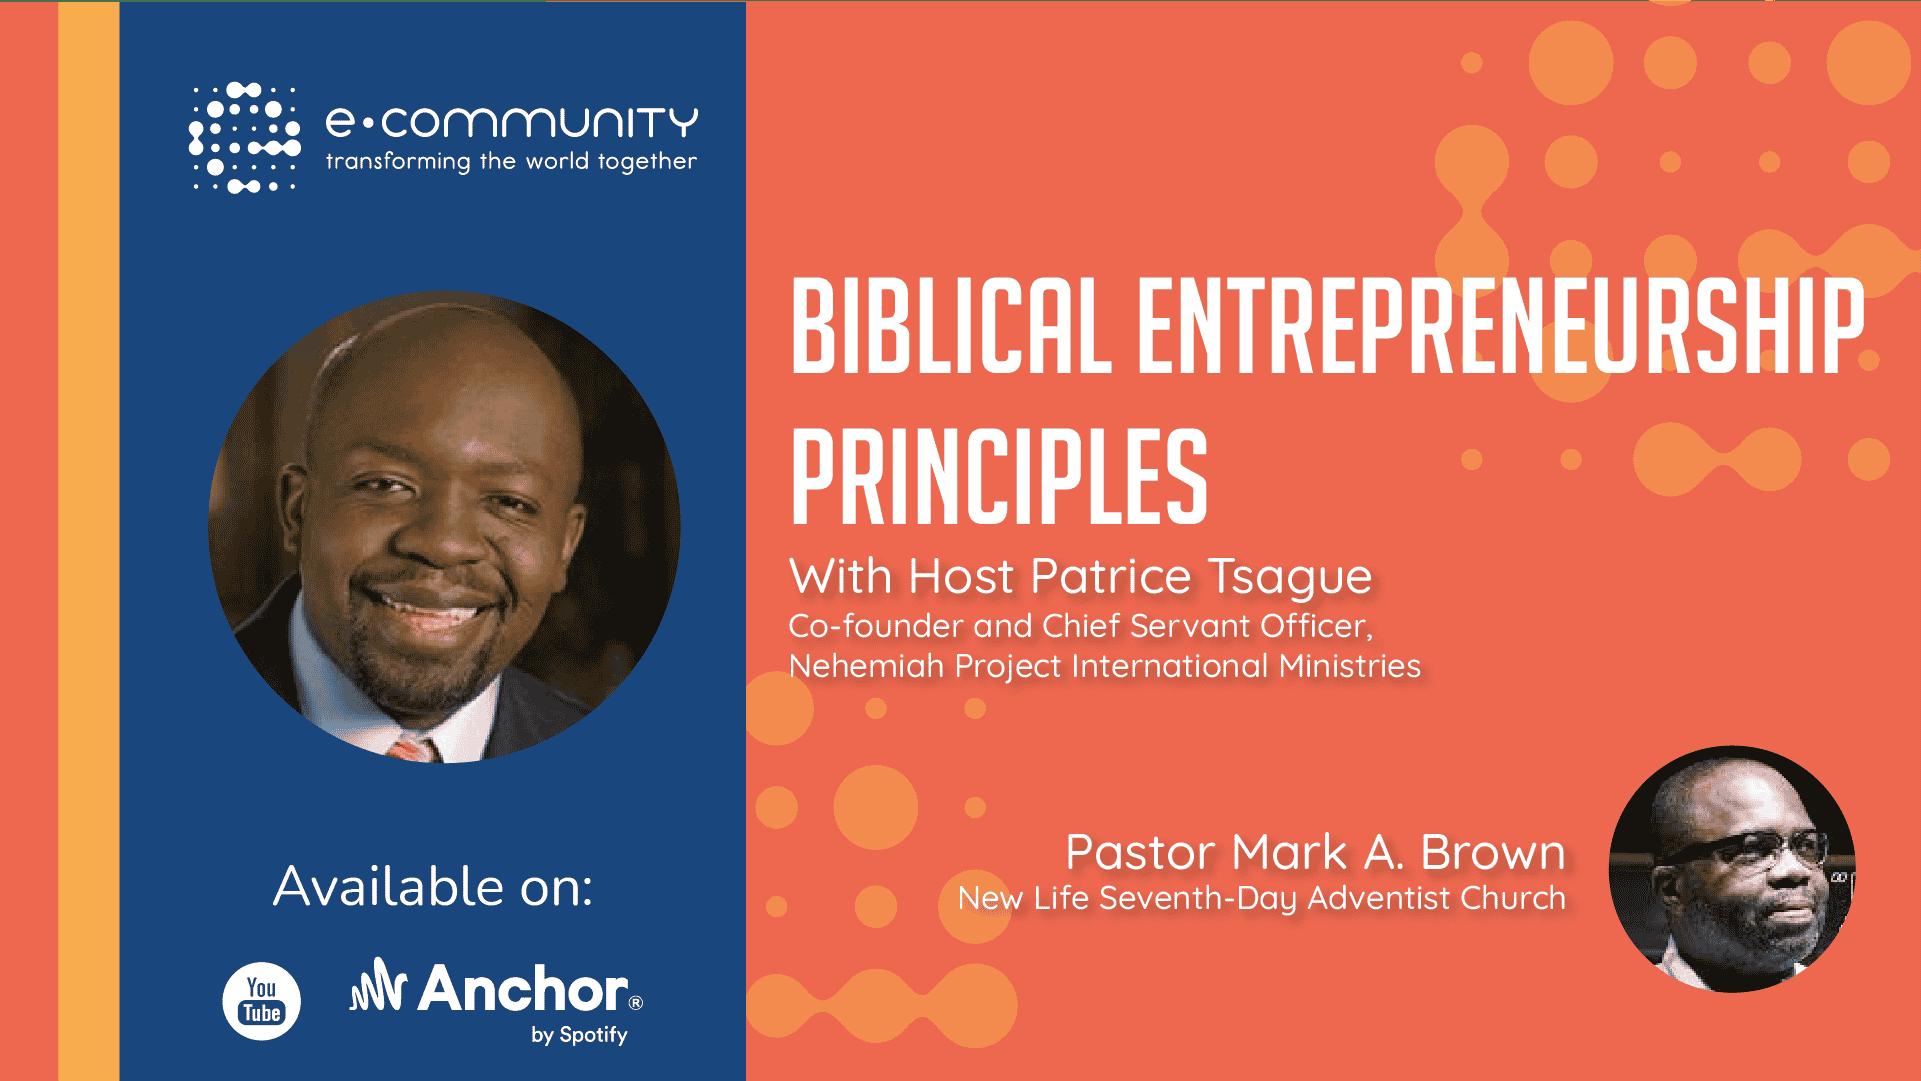 Biblical Entrepreneurship